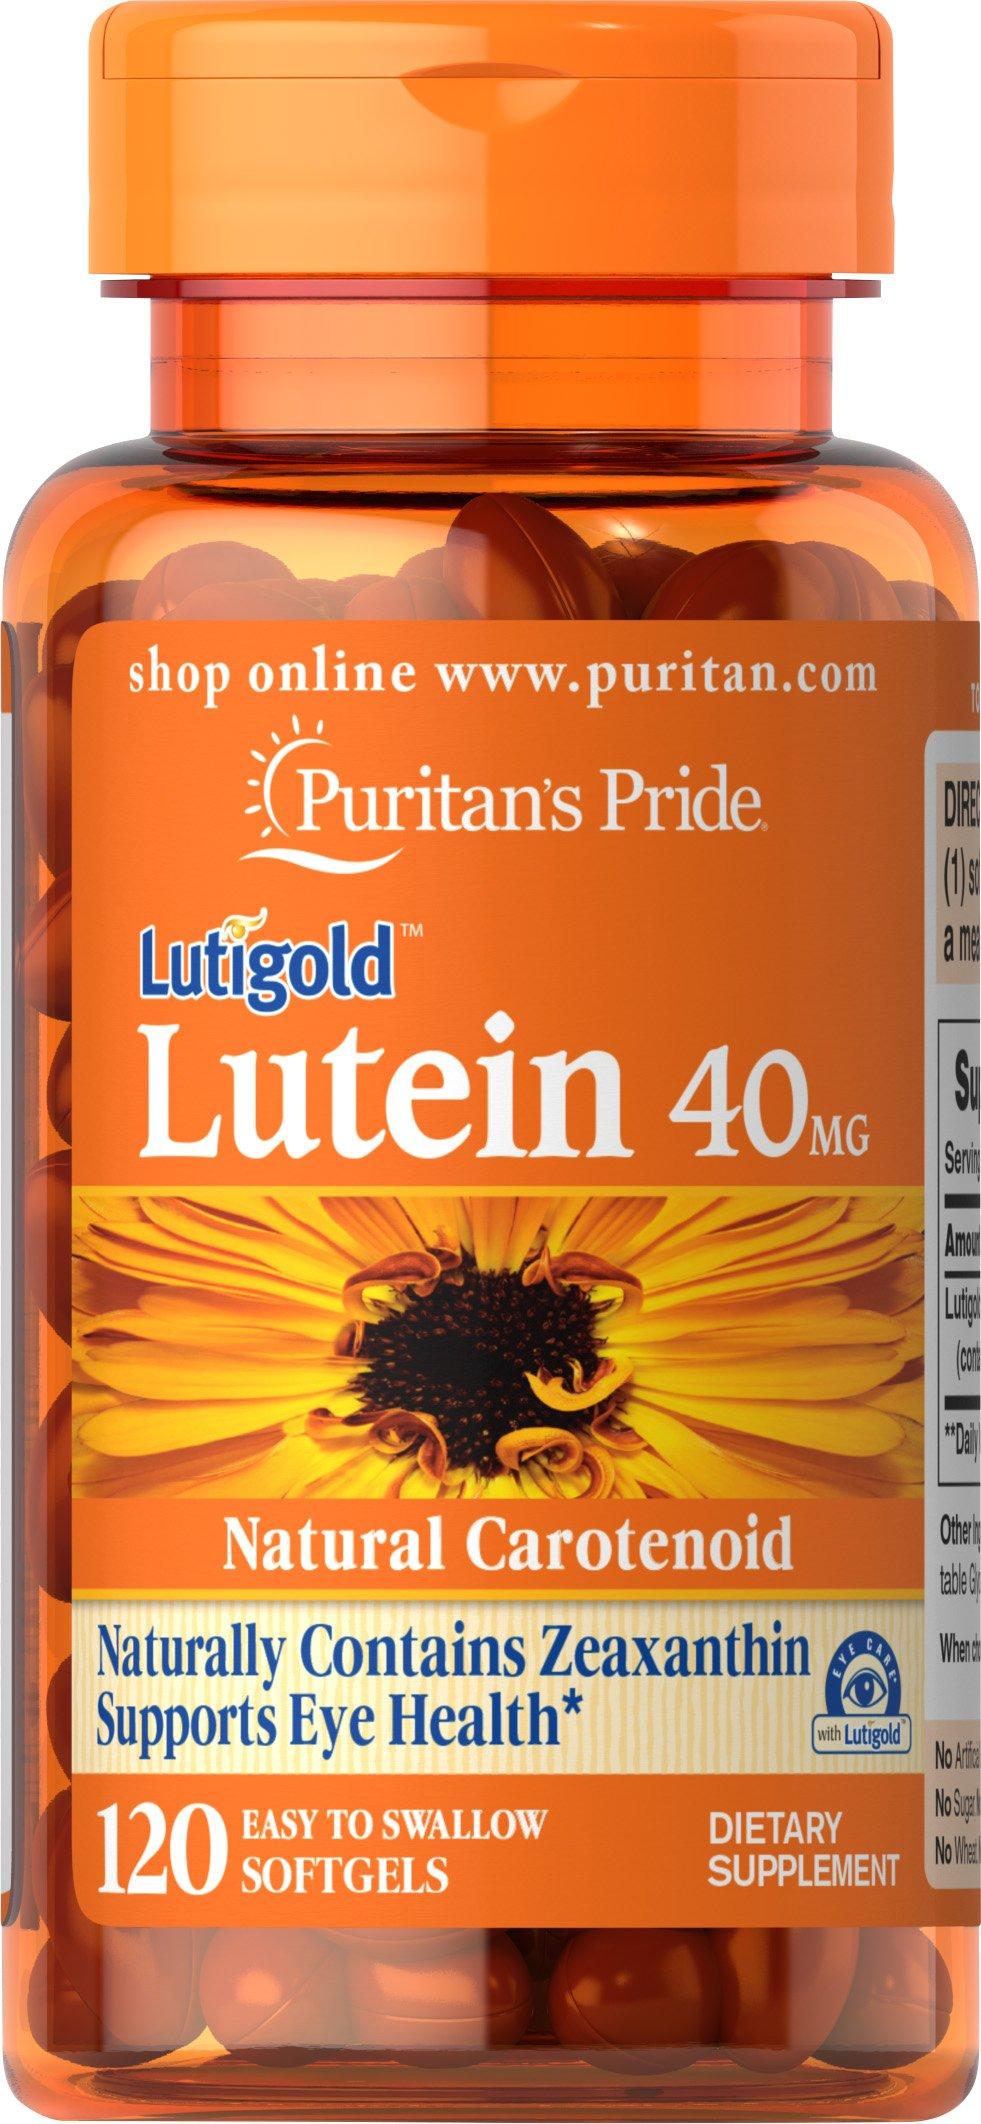 Puritan's Pride Lutein with Zeaxanthin 40 mg, Eye Health Supplement**, 120 Softgels